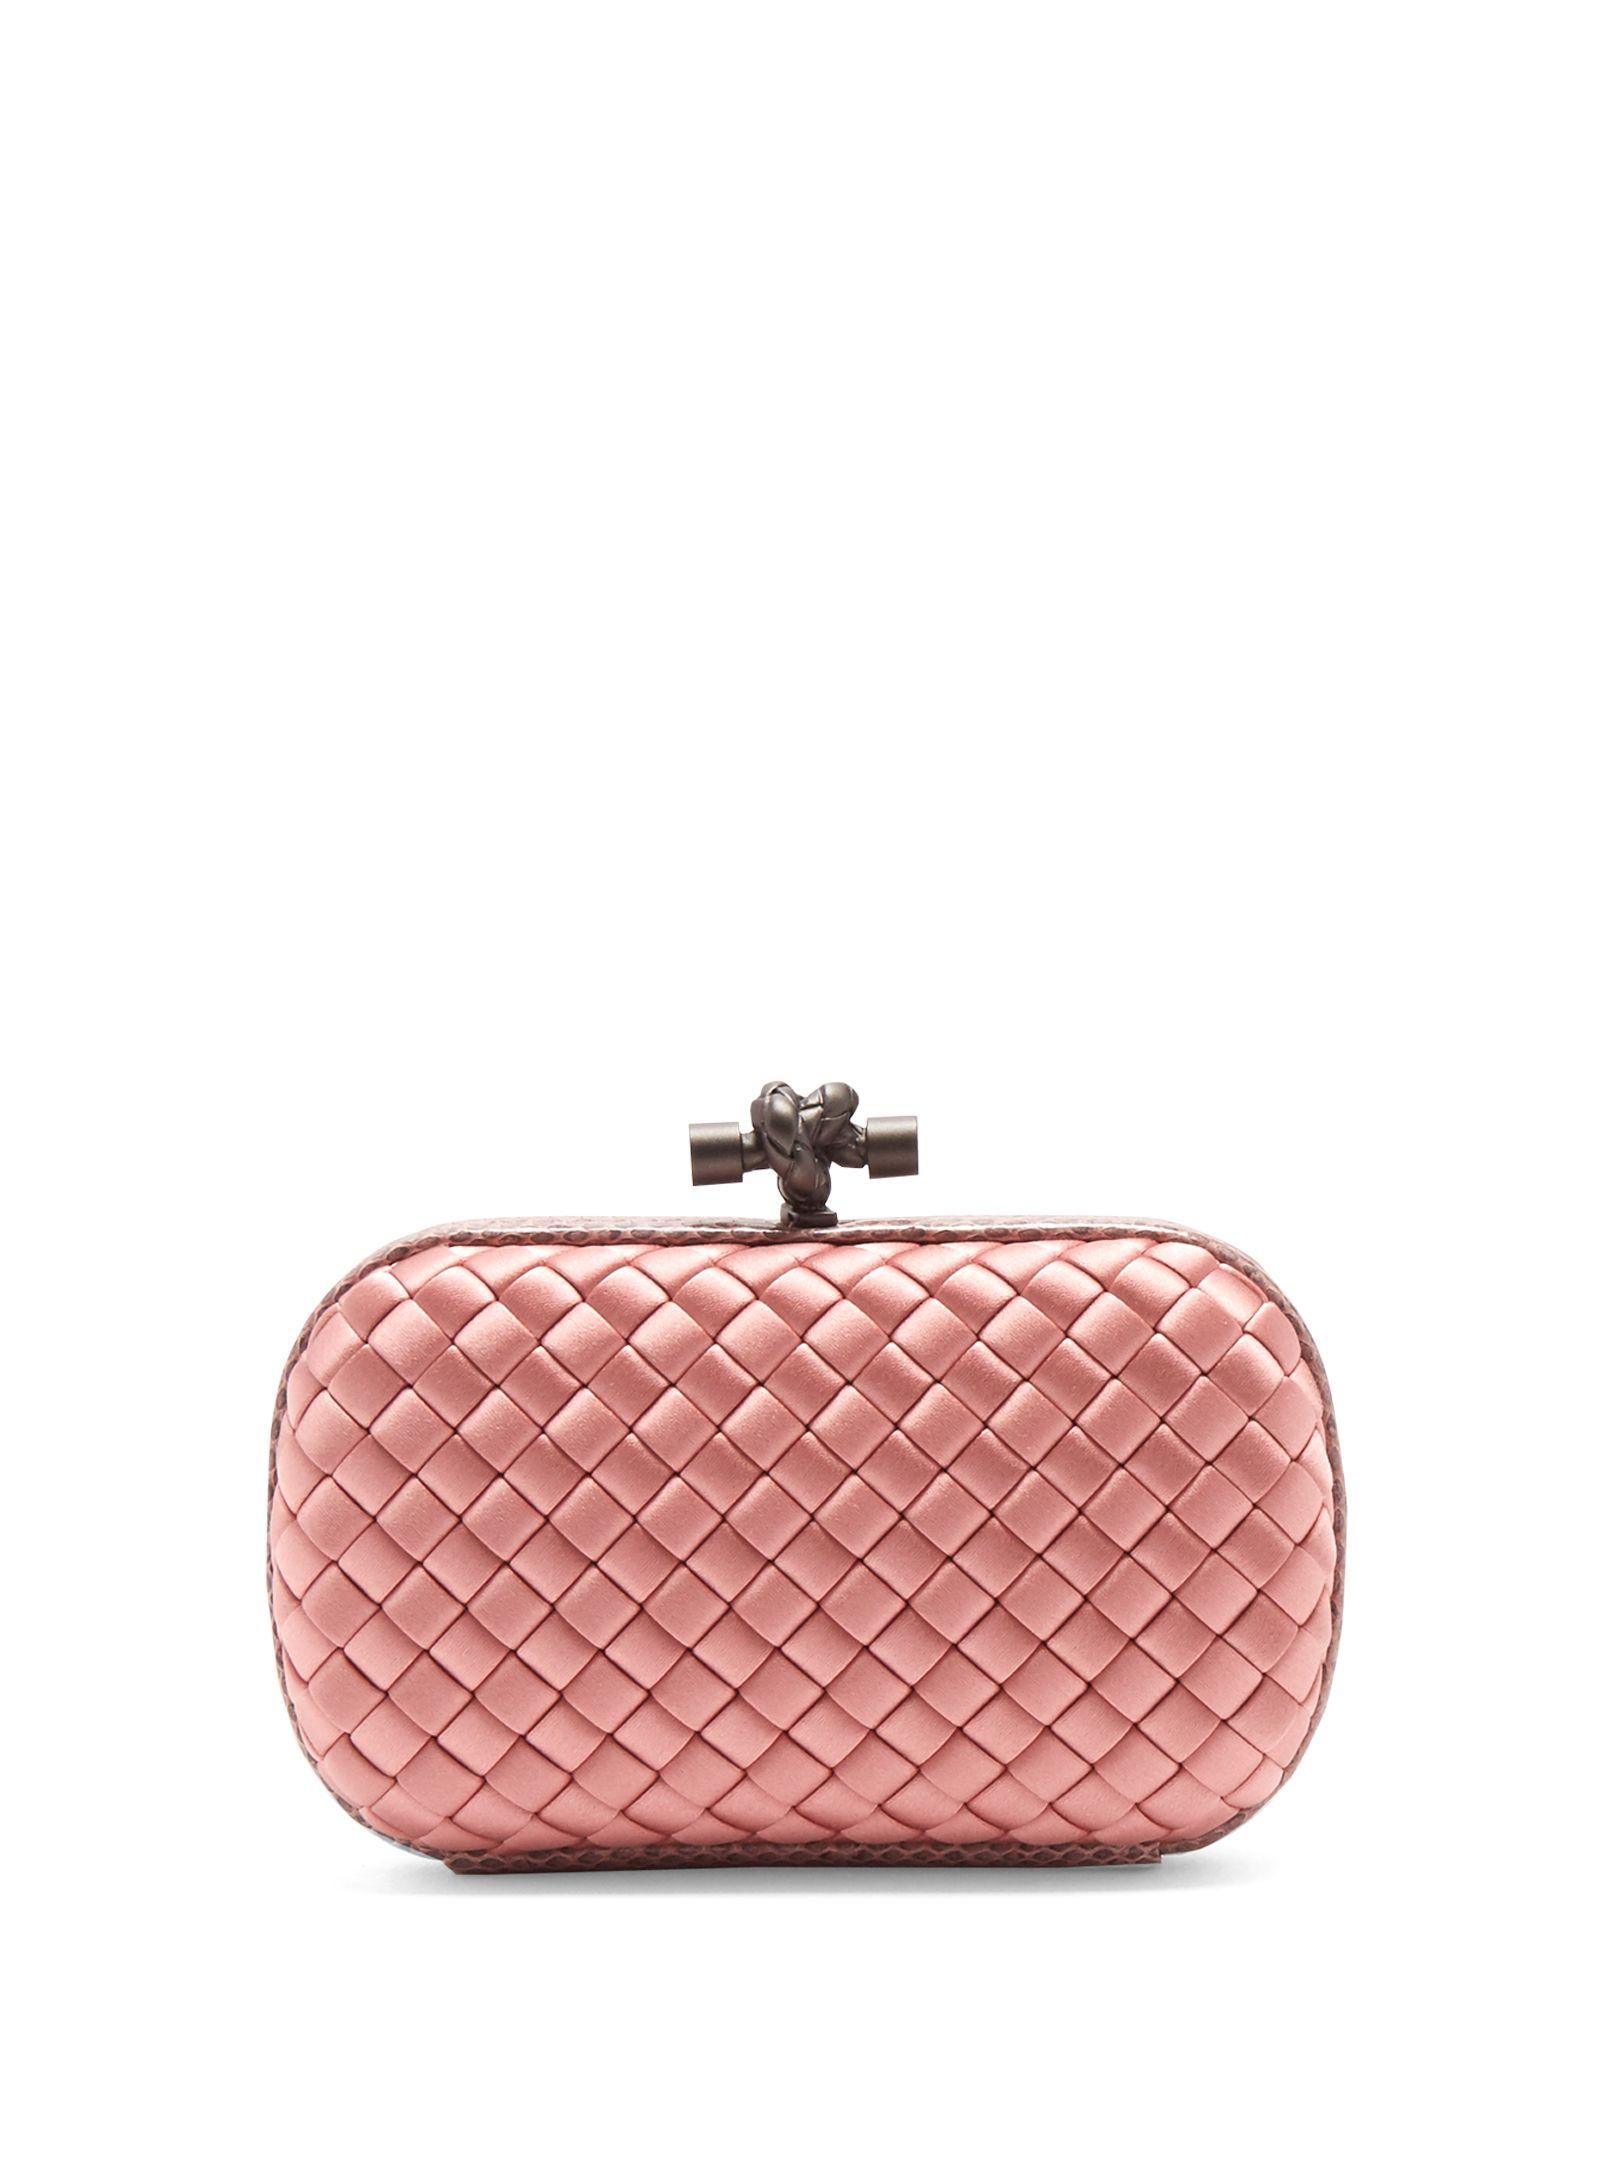 51258b033ed4 Click here to buy Bottega Veneta Knot satin and water-snake clutch ...